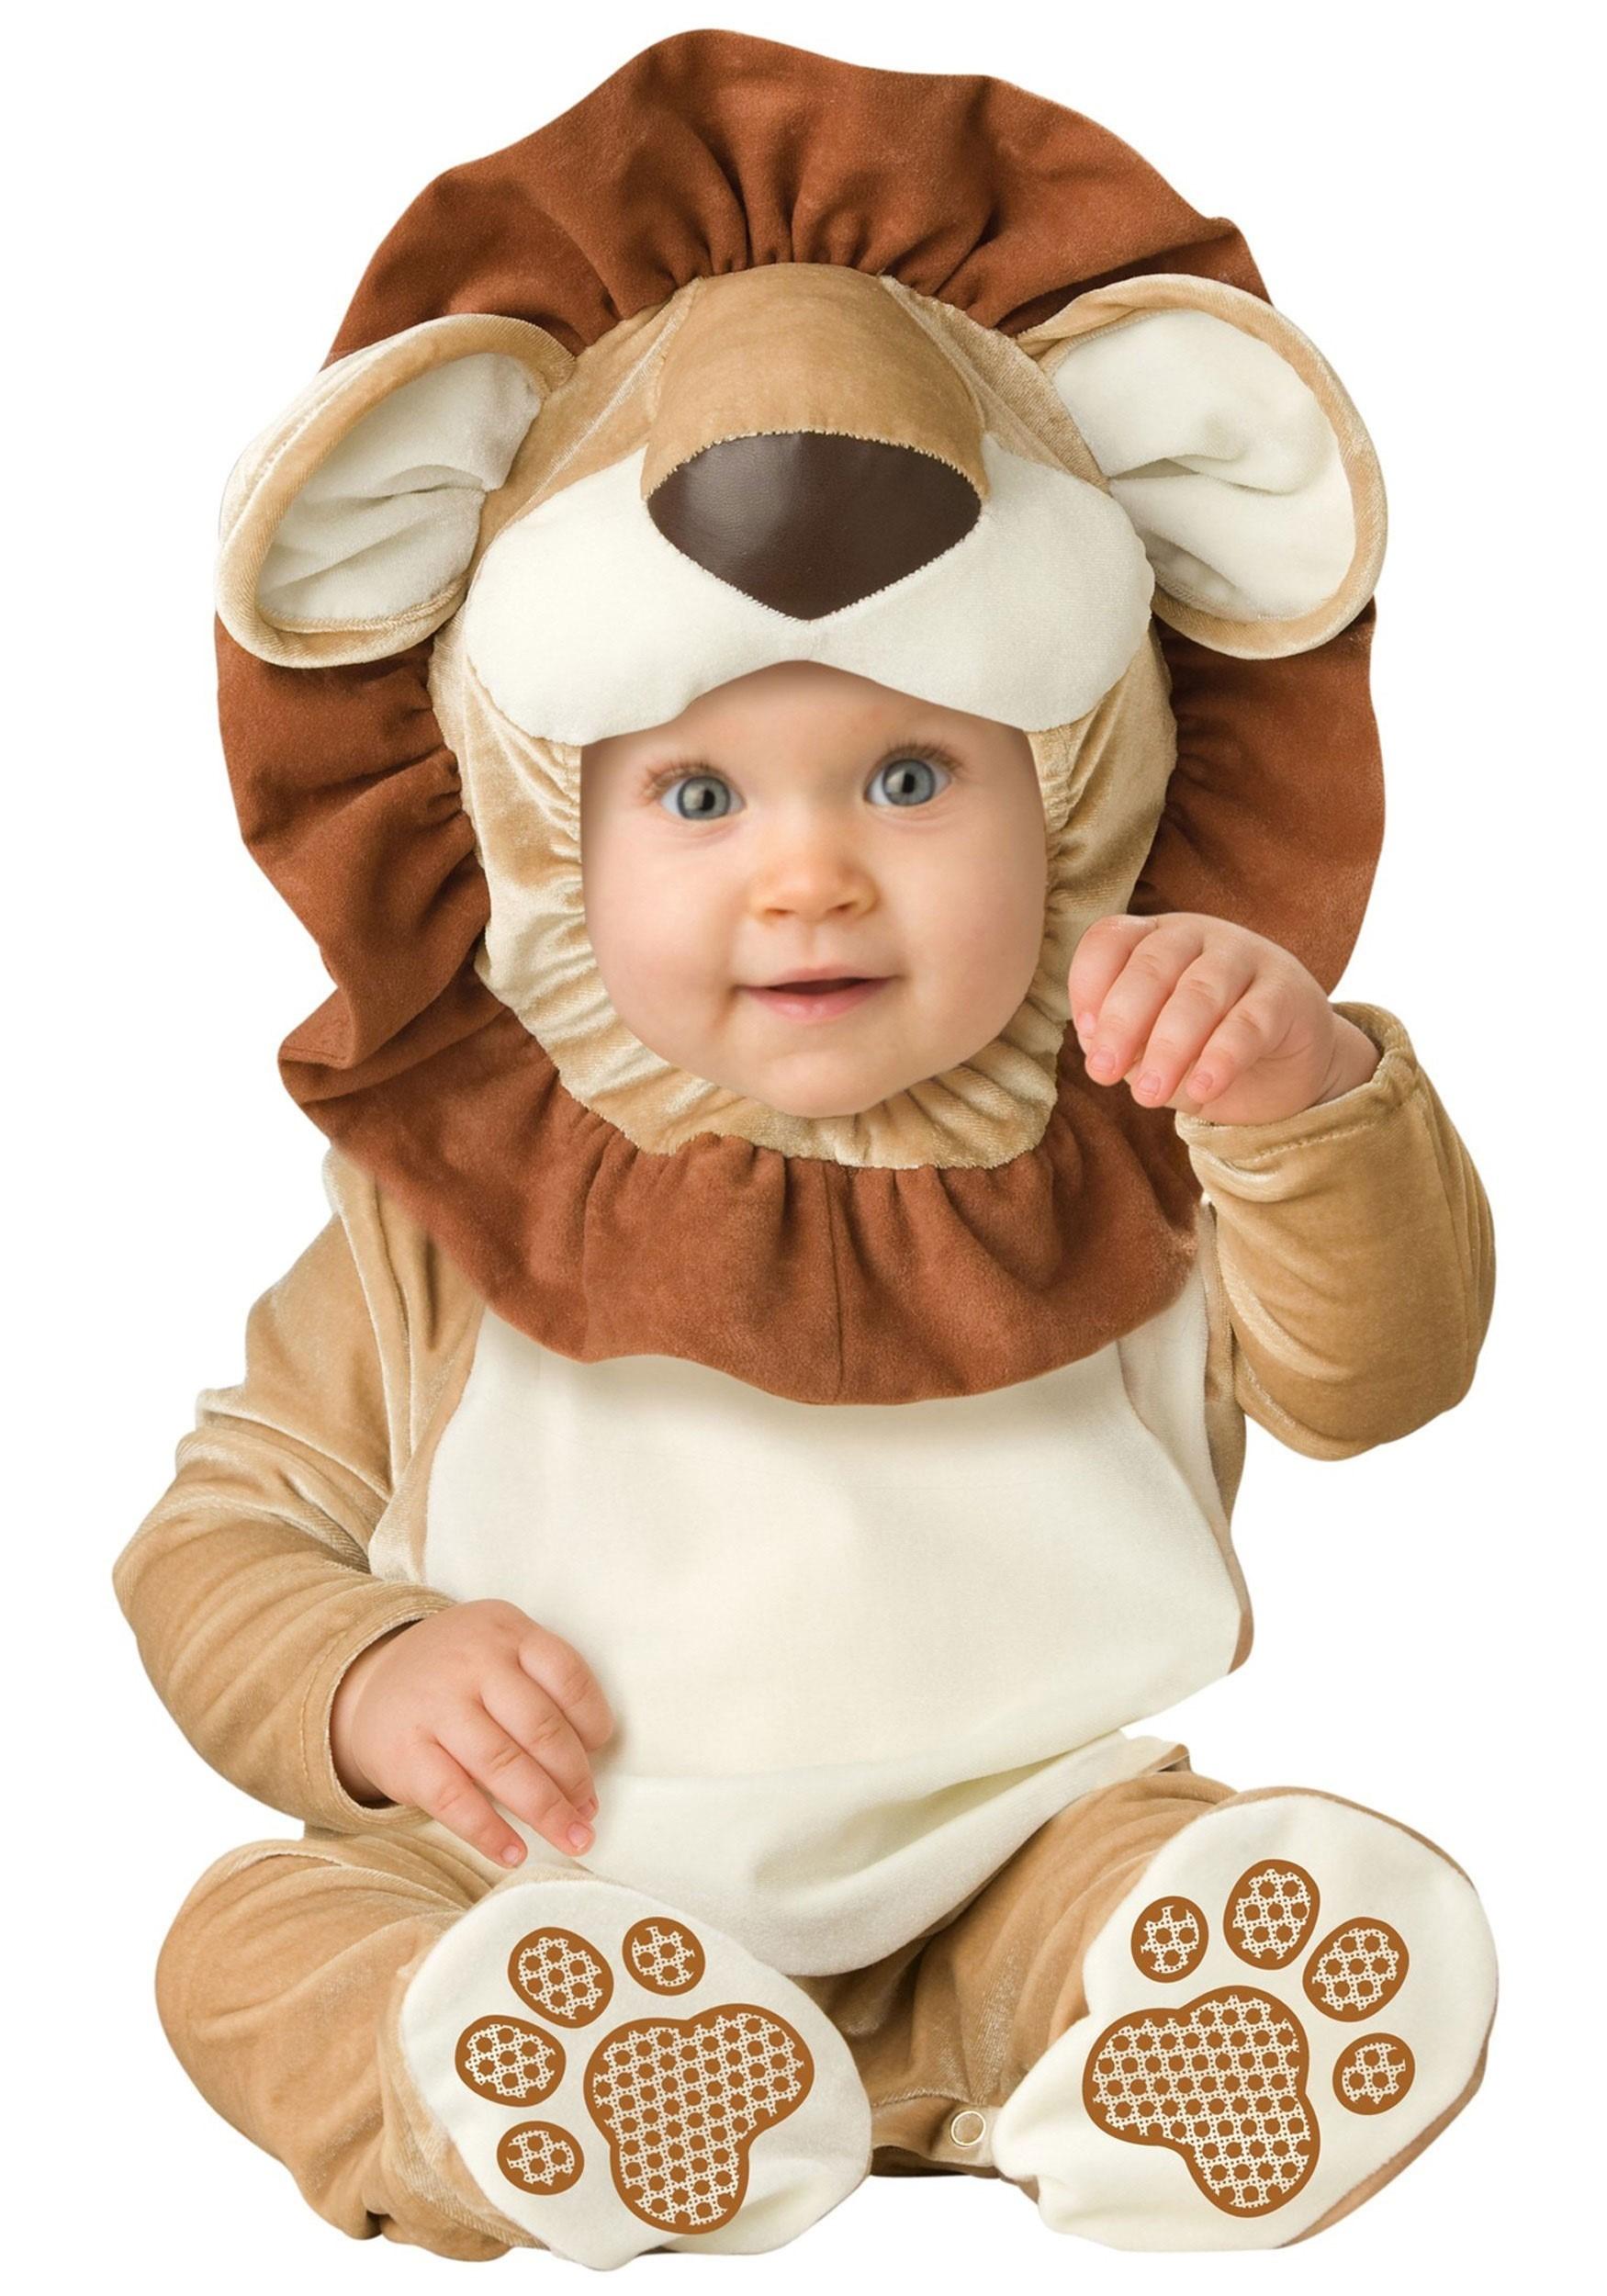 Lovable Little Lion Costume for Babies